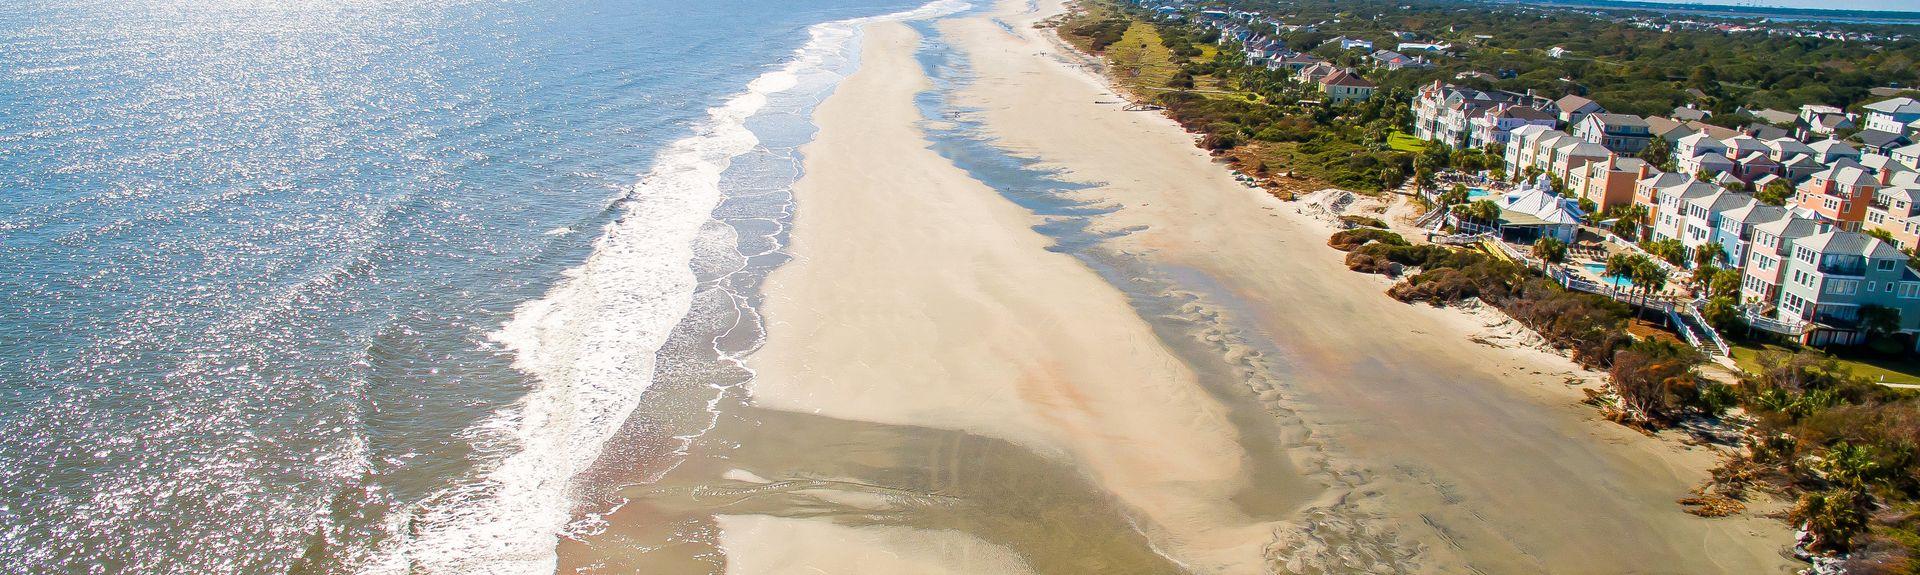 Pelican Bay, Wild Dunes, Isle of Palms, SC, USA